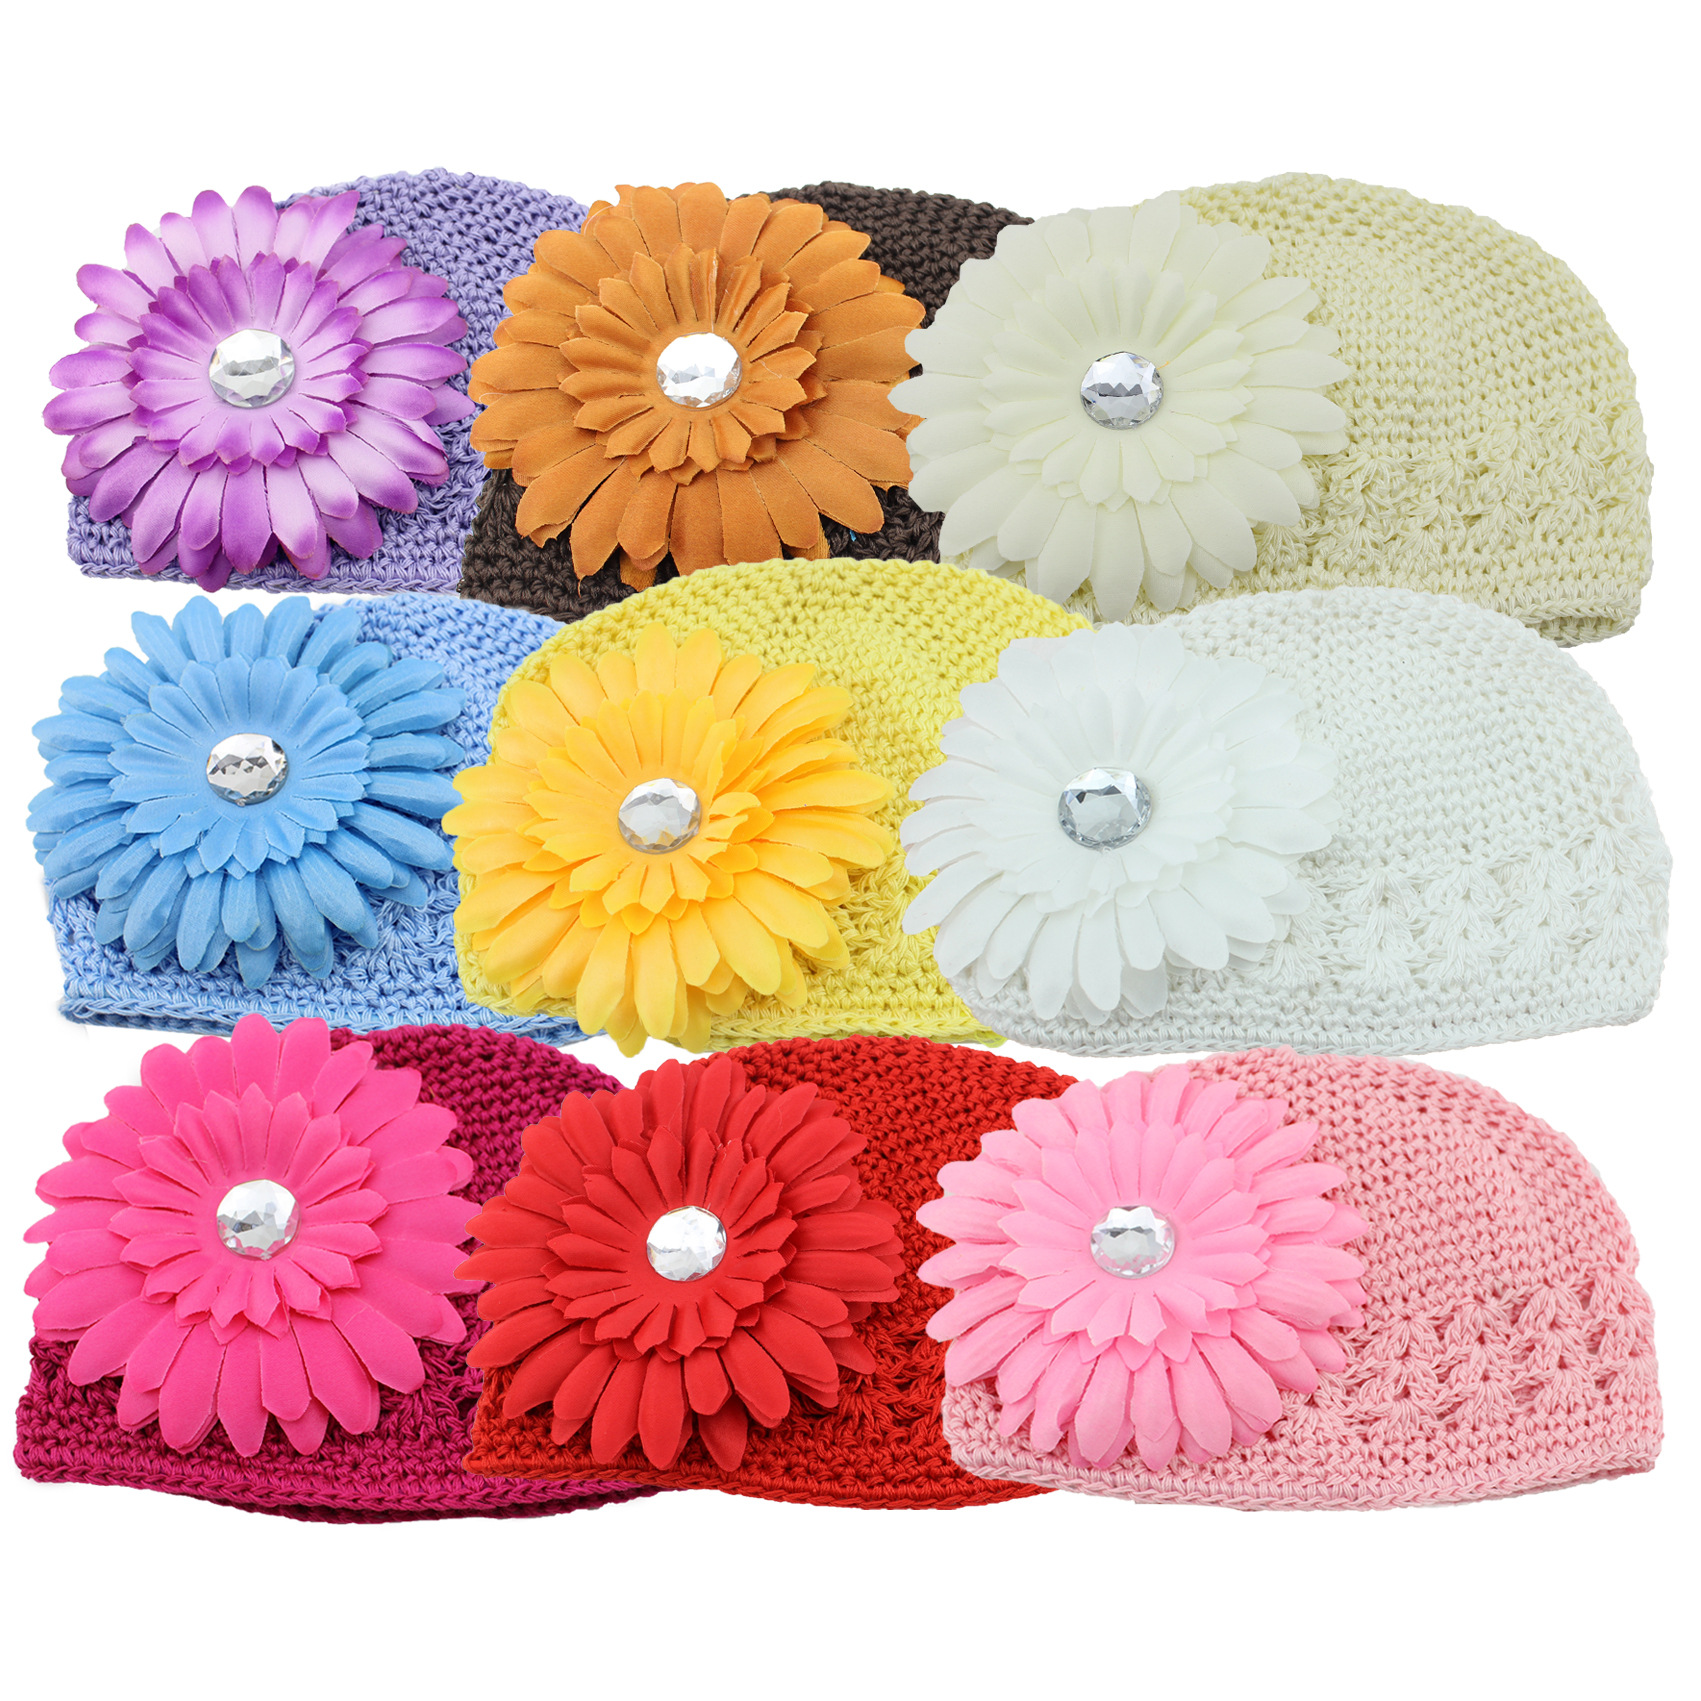 2016 Fashion Cute European Baby Accessories Gerbera Flower Hollow Hand Crochet Cotton Beanie Knitted HatОдежда и ак�е��уары<br><br><br>Aliexpress